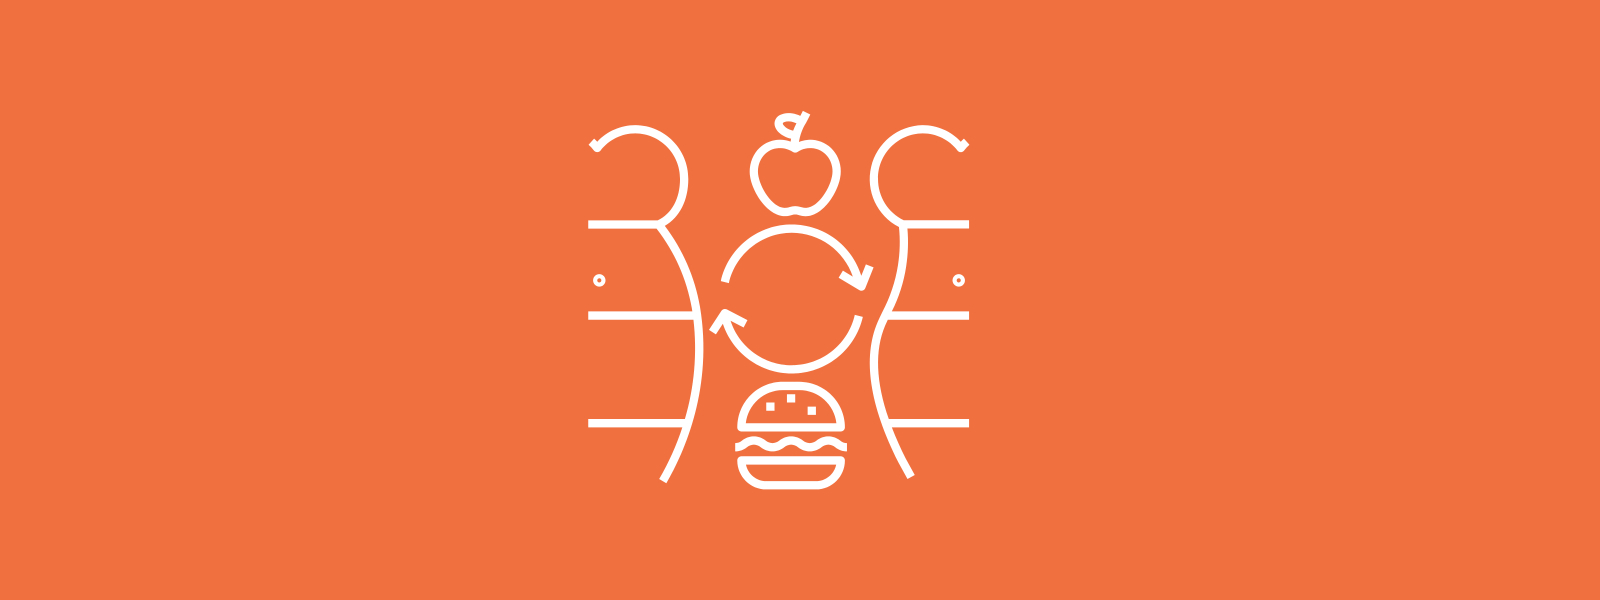 Icon background of weight changes through healthier diet